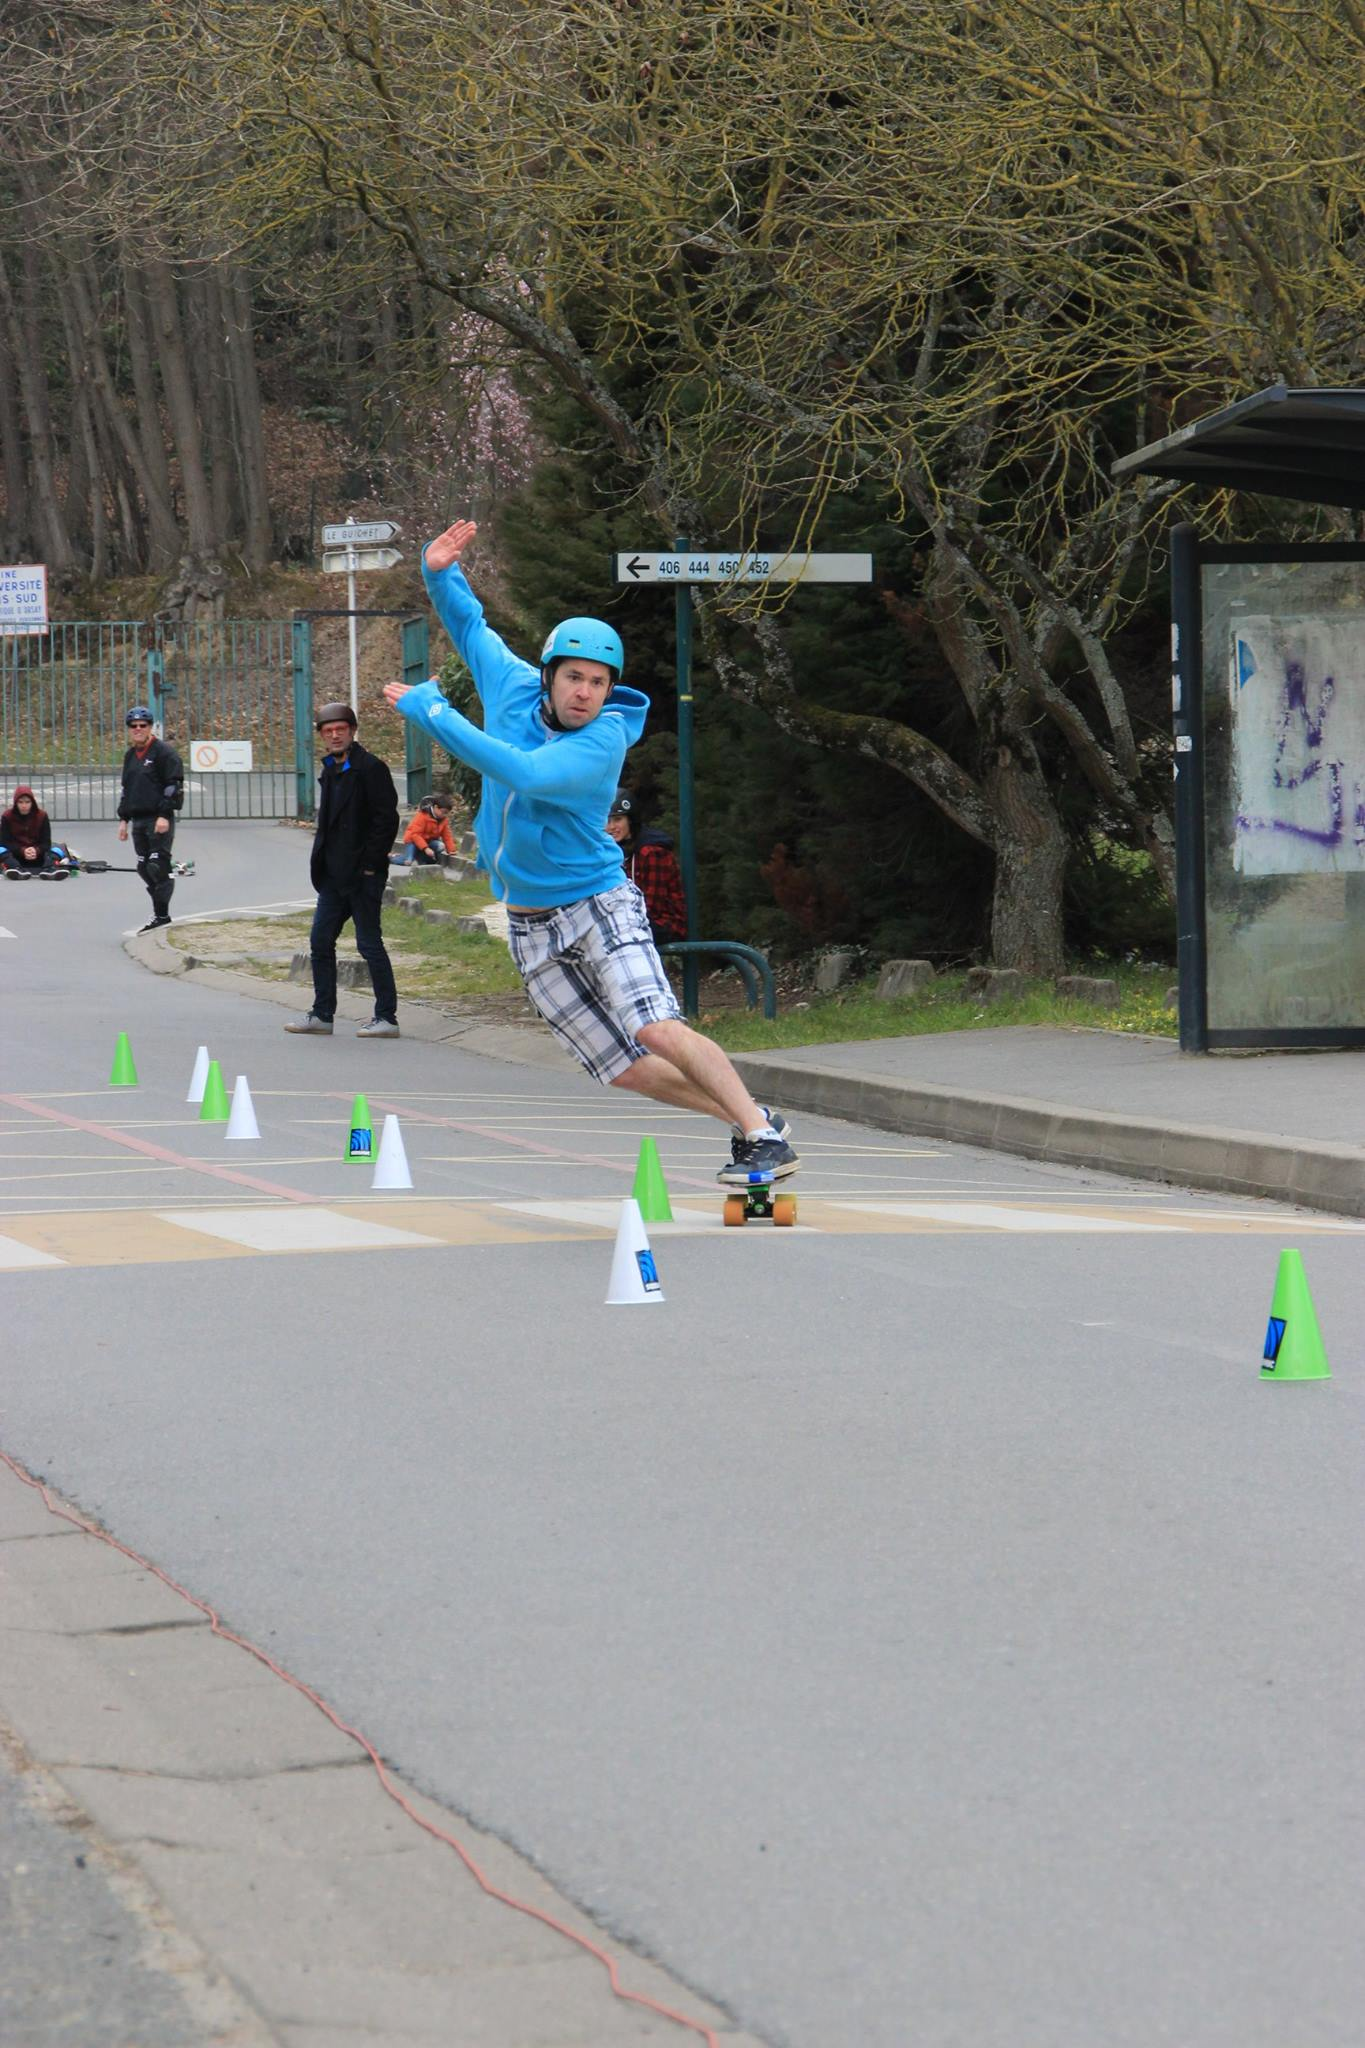 Vincent Tanguy - Hybrid slalom - Pirate slalom skateboard d'Orsay